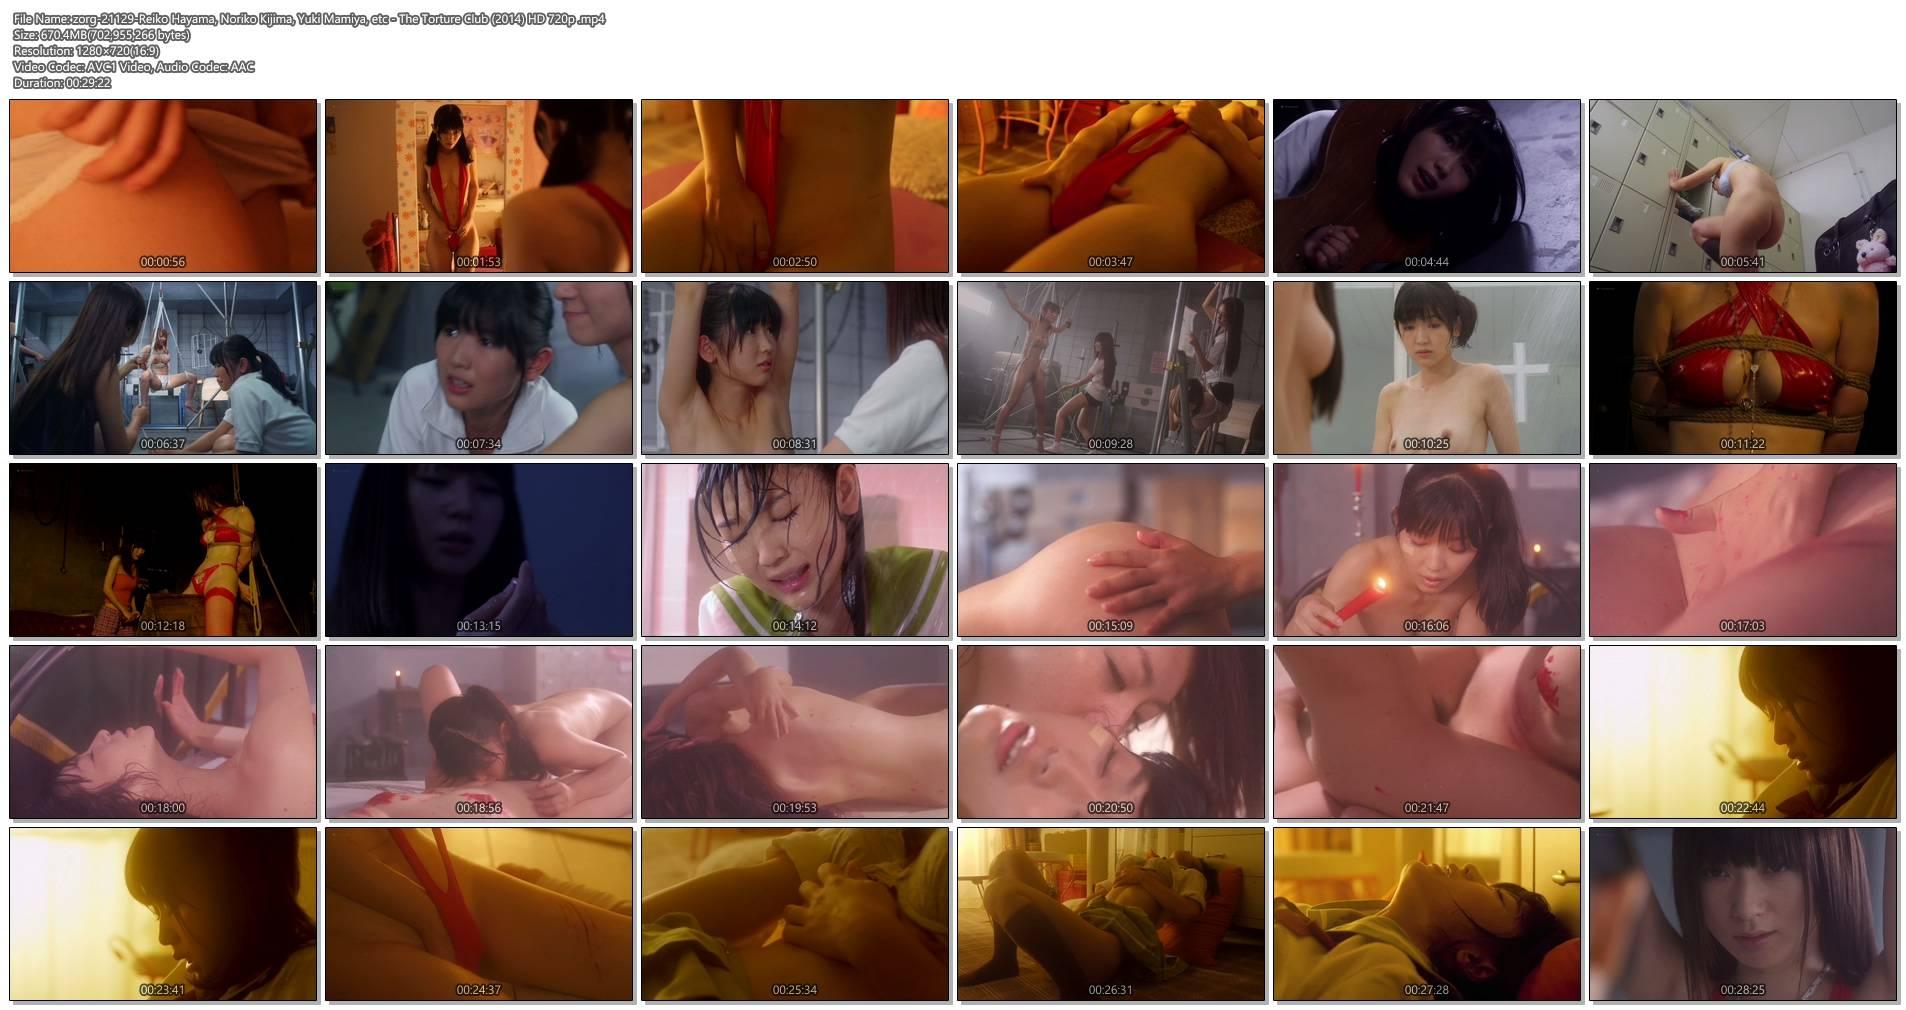 Reiko Hayama nude bush Noriko Kijima, Yuki Mamiya and other's nude, BDSM, lesbian - The Torture Club (2014) HD 720p (1)